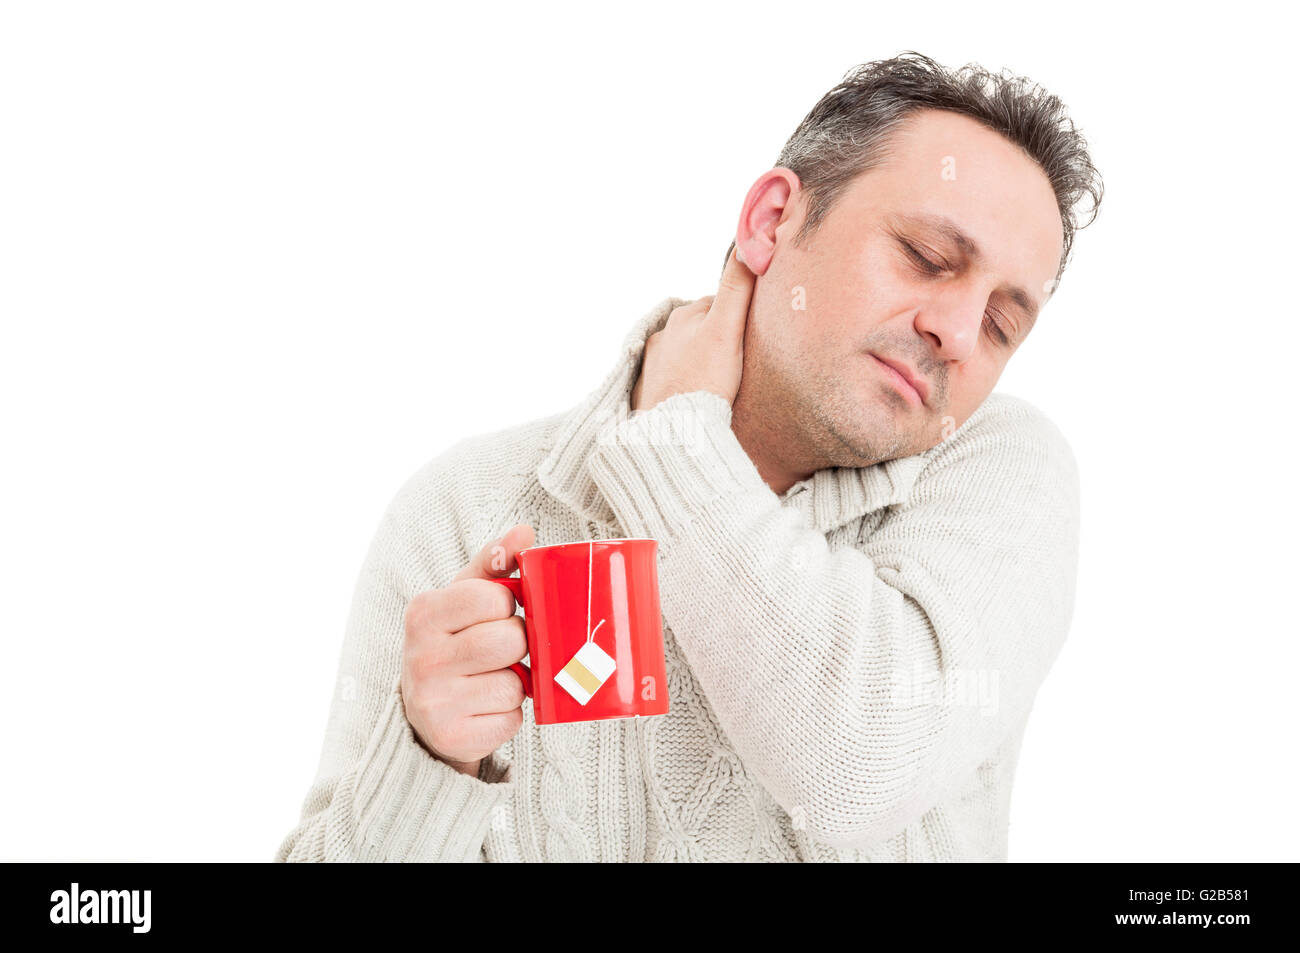 Sick man grabbing the back of the neck suffering of flu virus - Stock Image